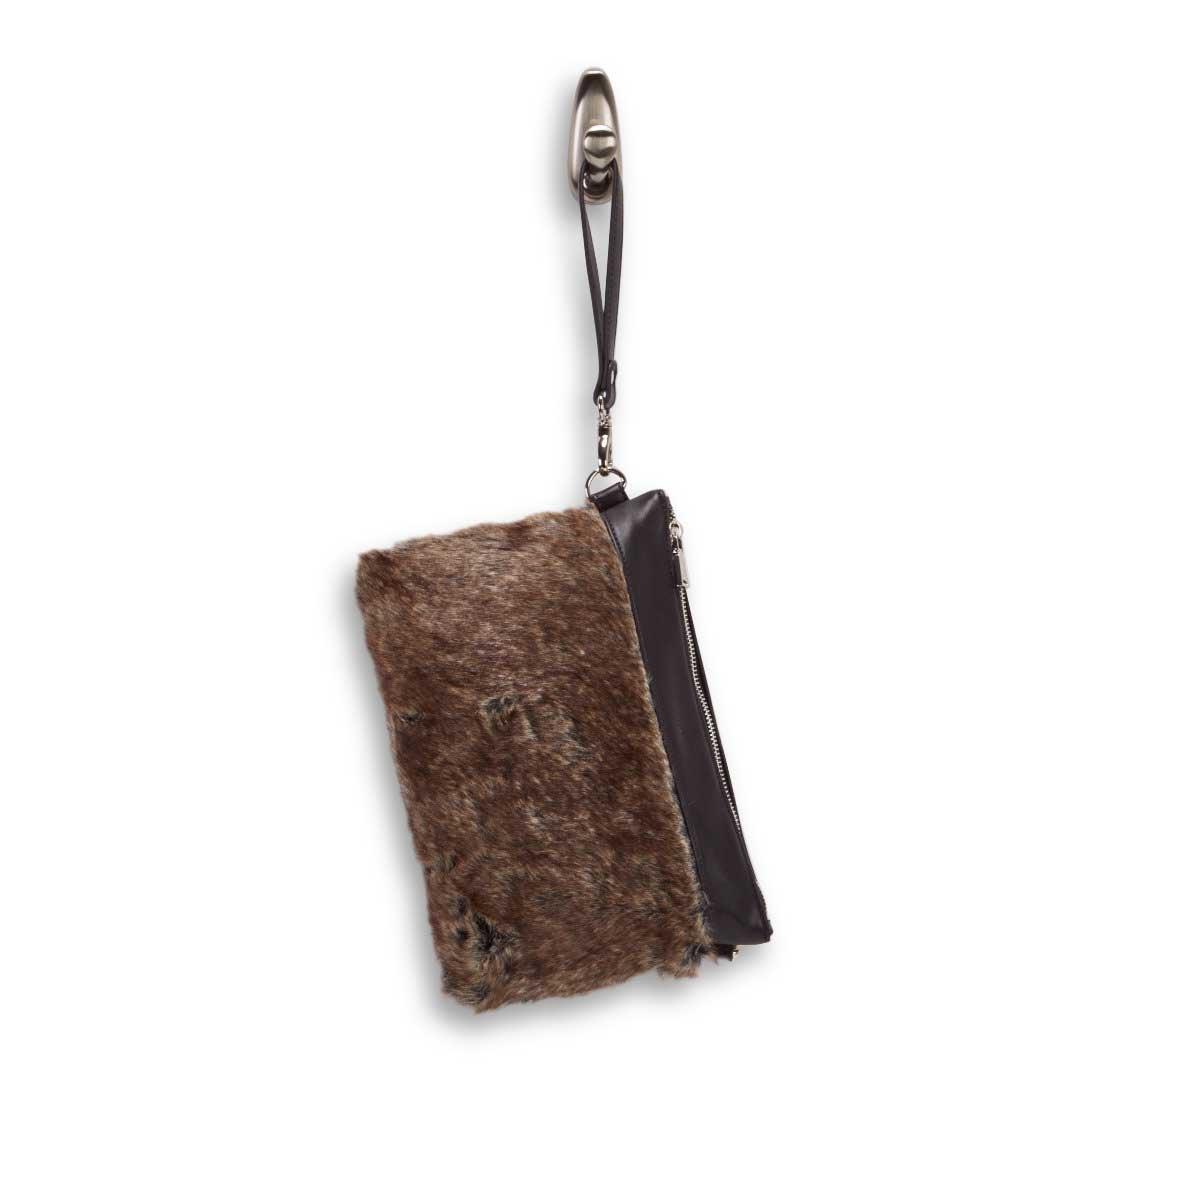 Lds black/brown clutch crossbody